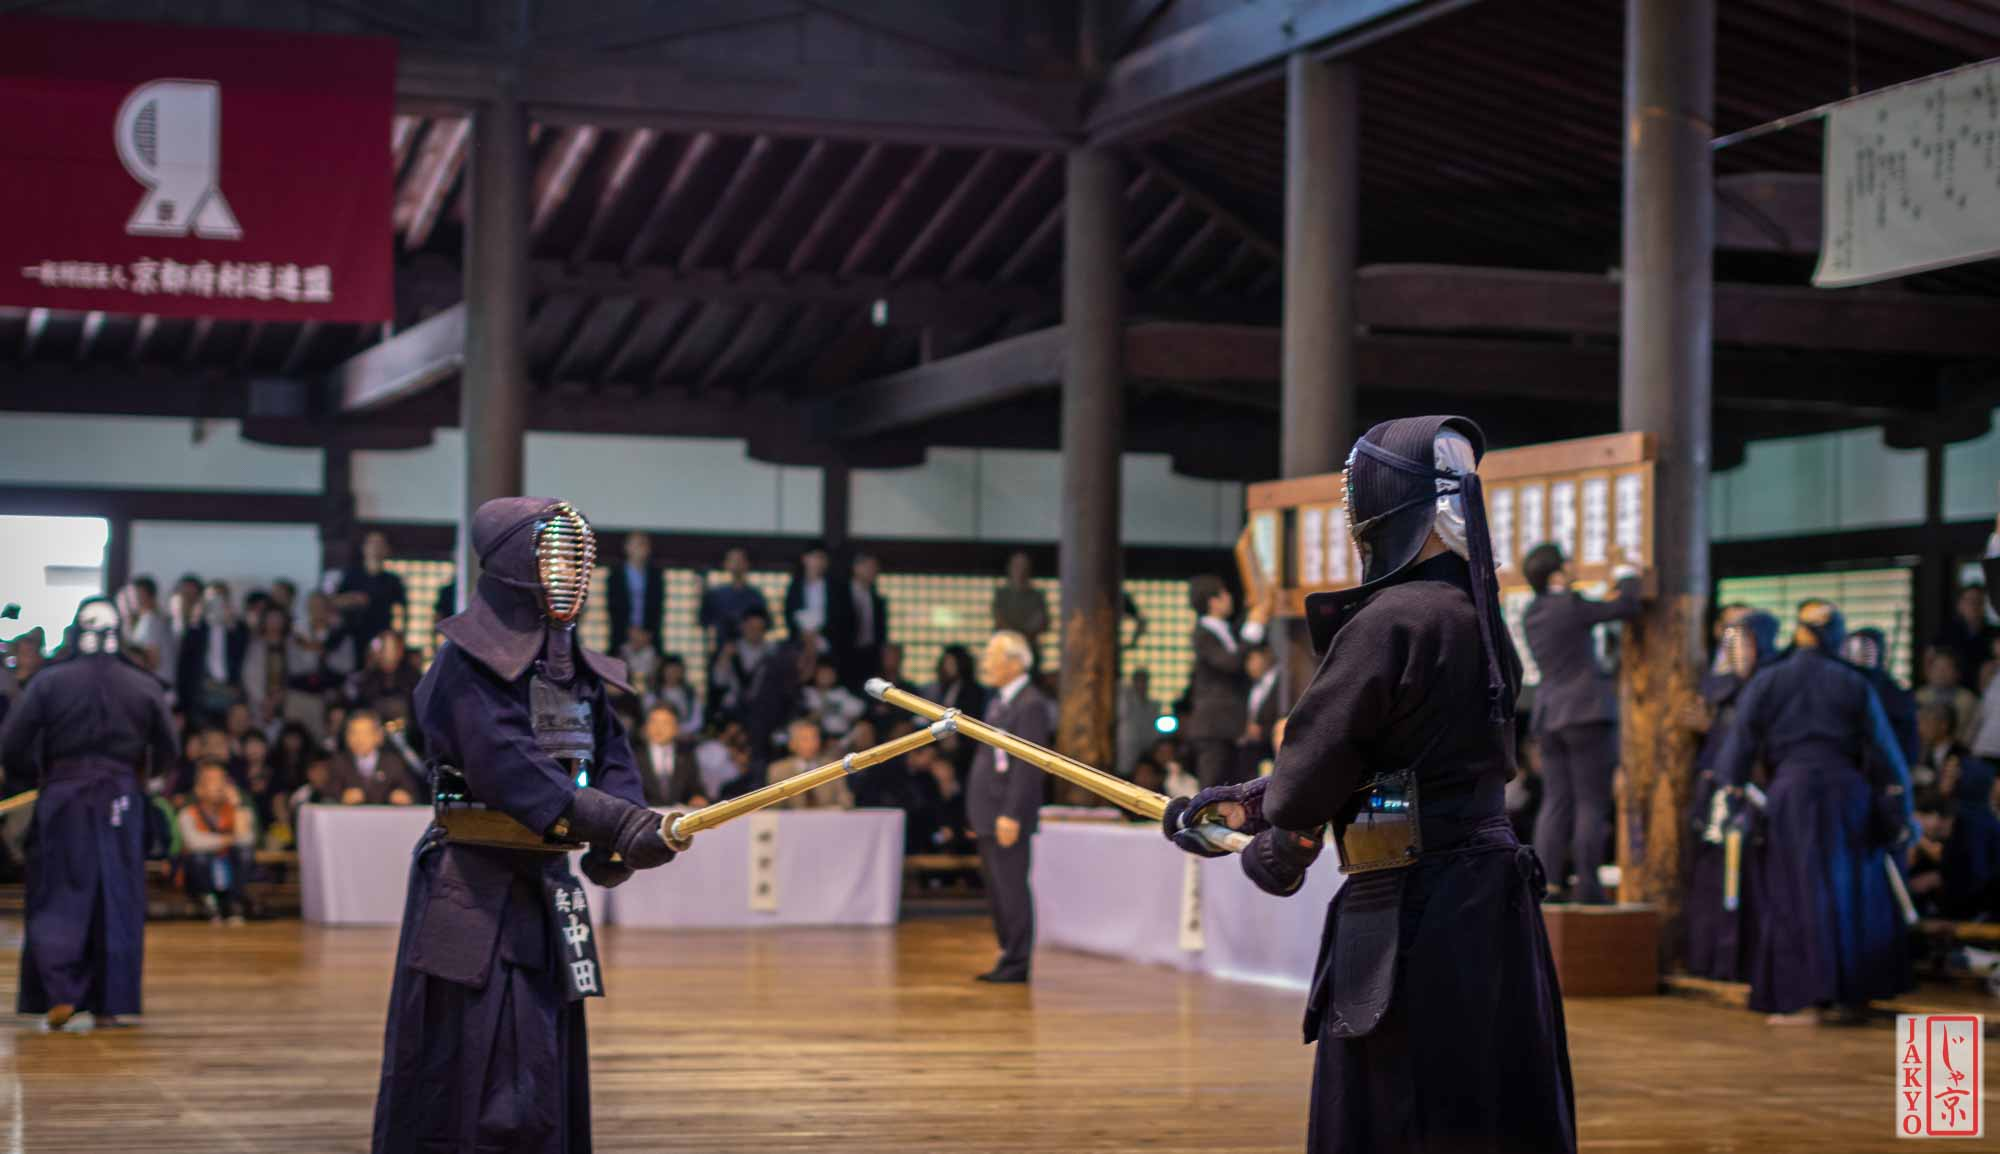 Kendo at the 115th Enbu Taikai 2019, Kyoto / J2019, Japan, Kansai, Kioto, Kyoto, 京都, 日本, 関西